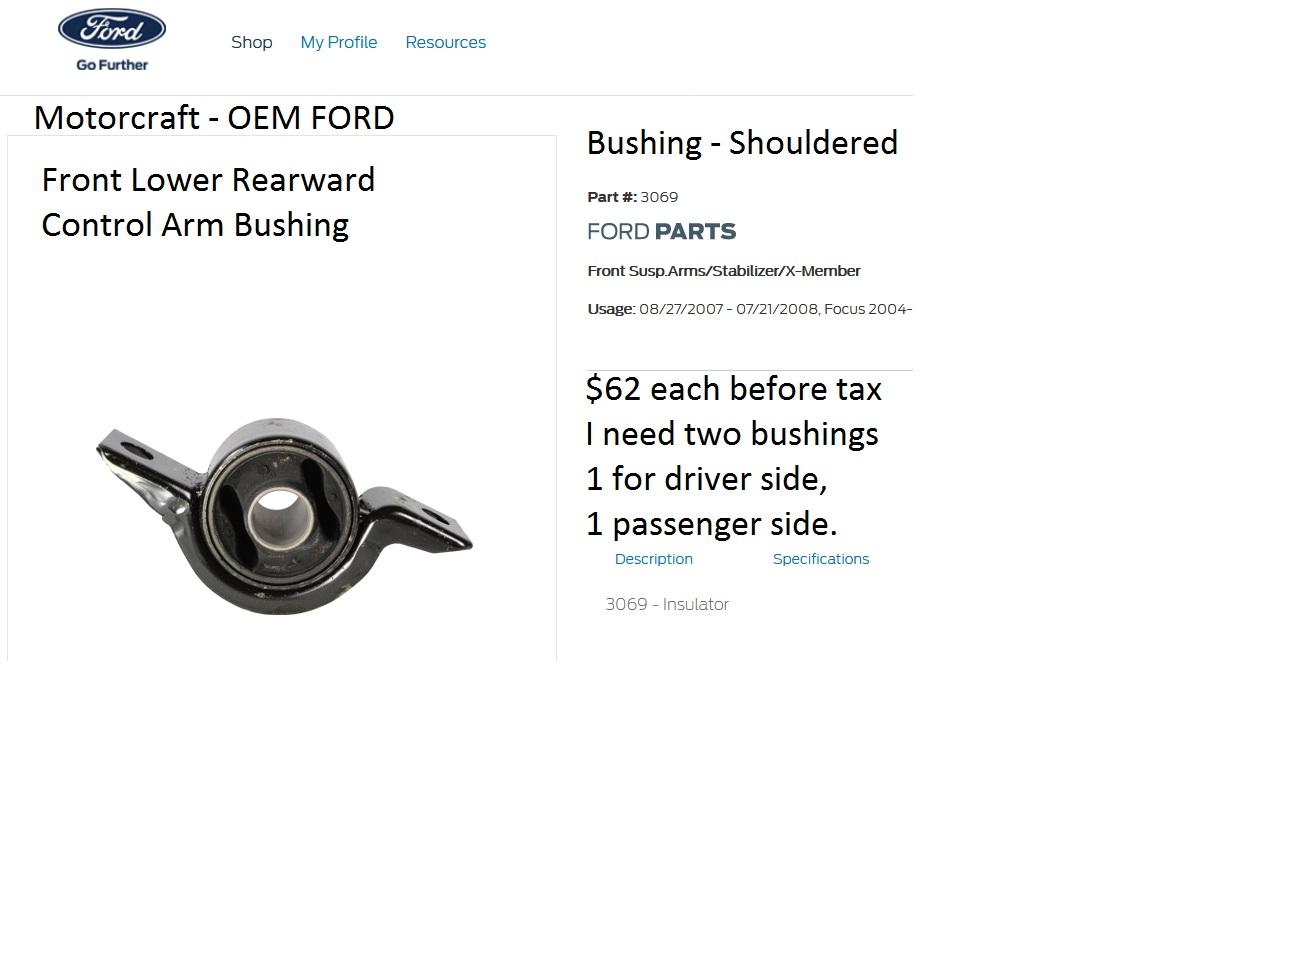 Bushings Suspension Choice - Moog vs OEM Ford Motorcraft (2008 Focus)-oem-ford-bushing.jpg